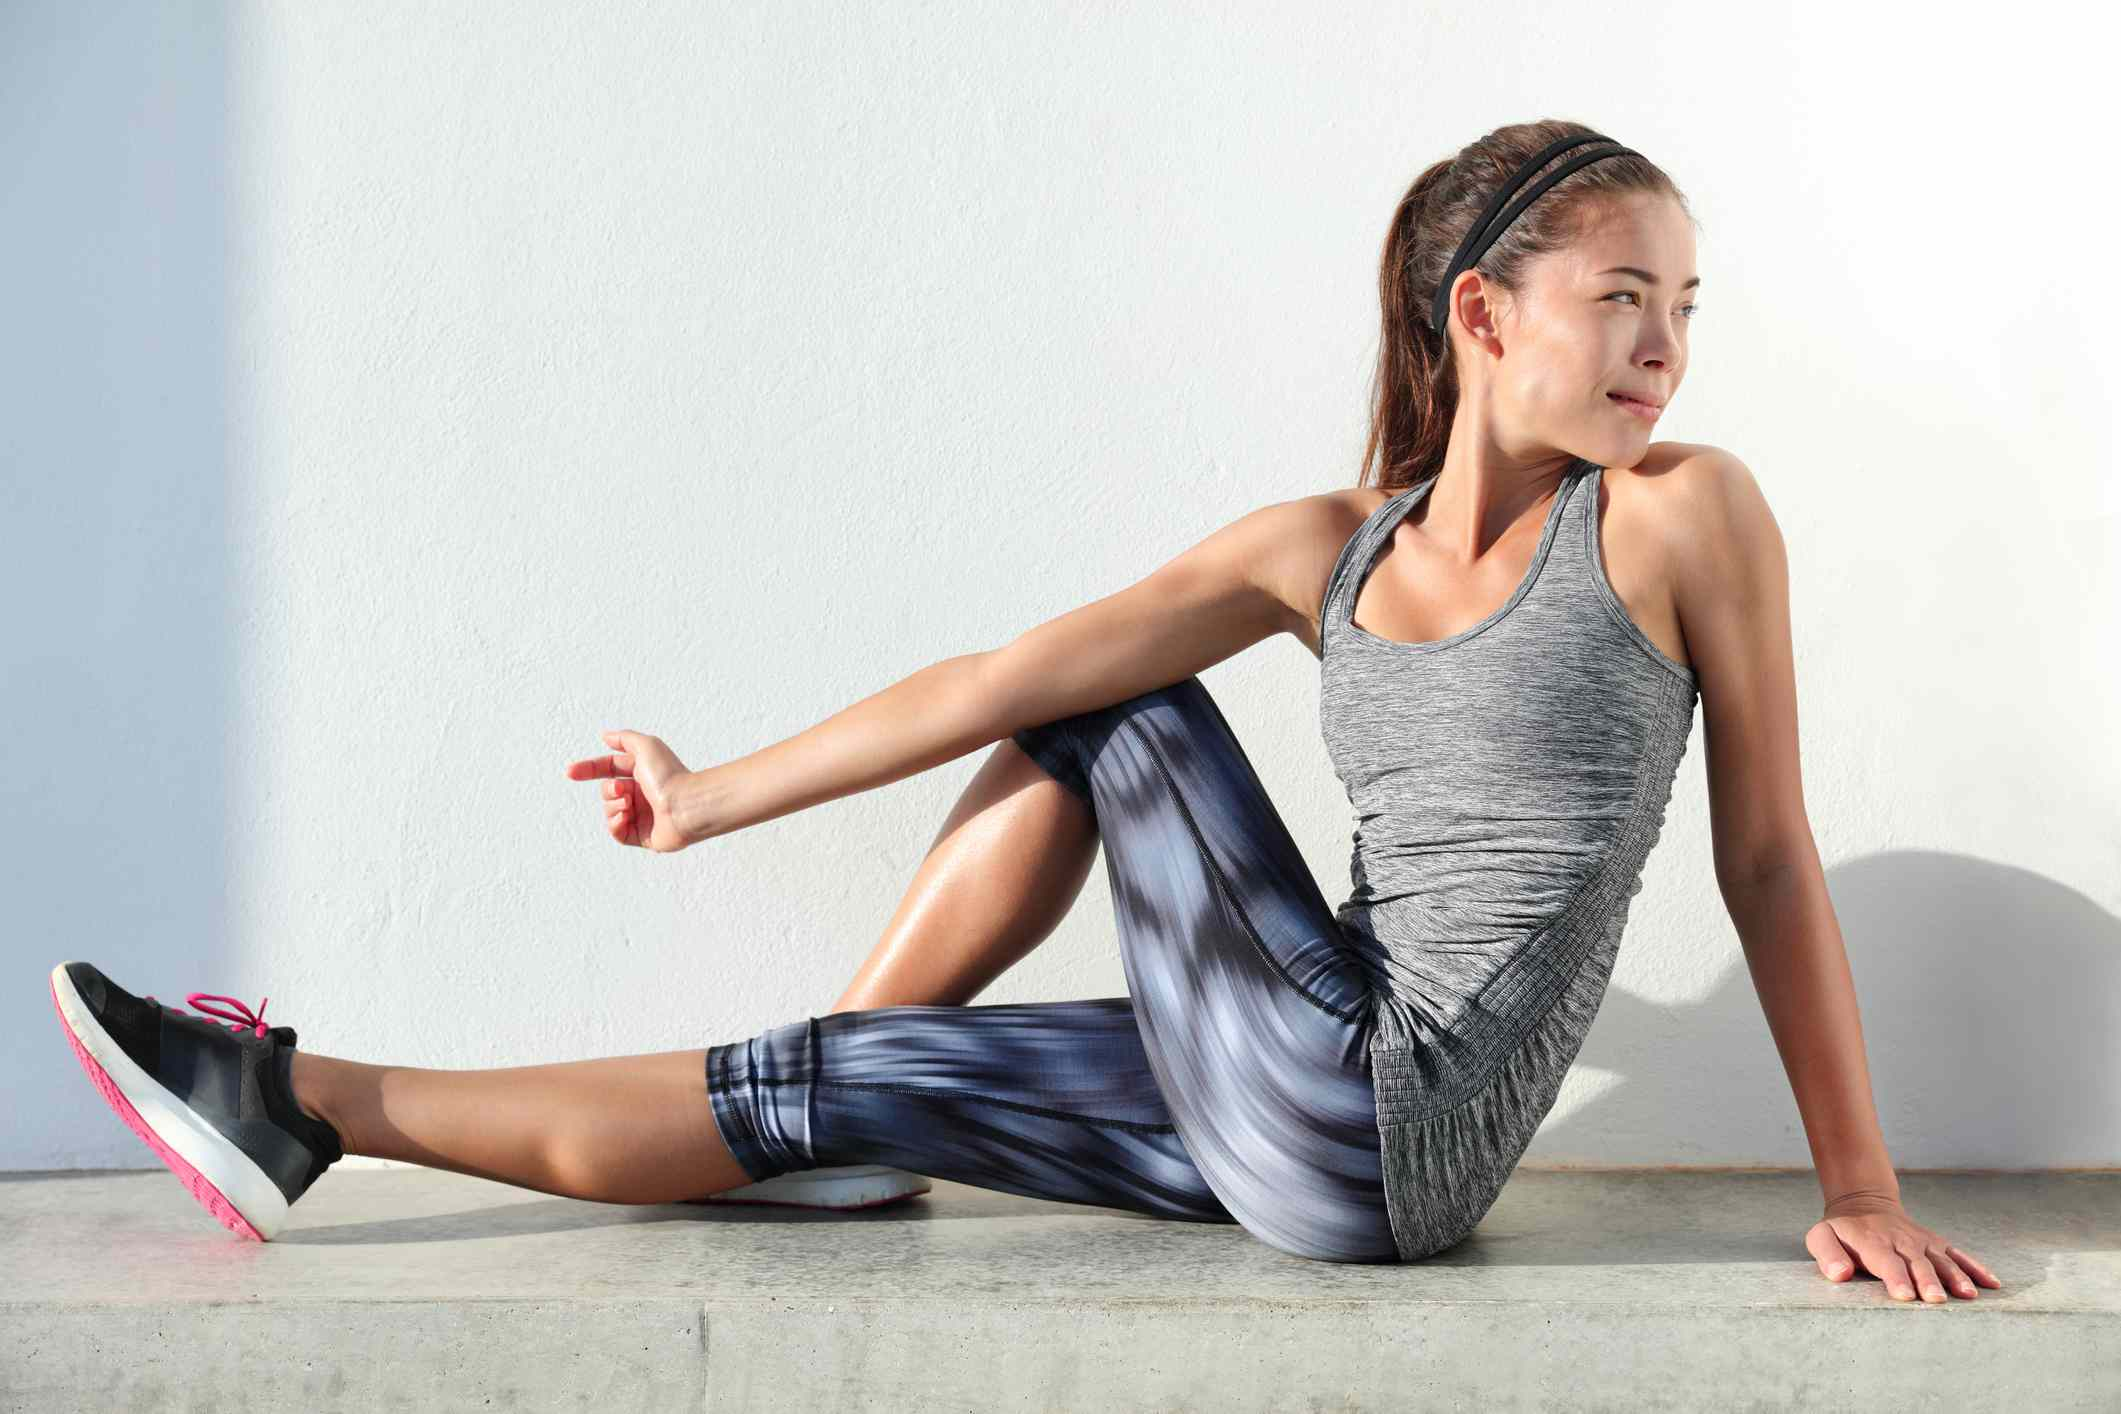 The sitting piriformis stretch